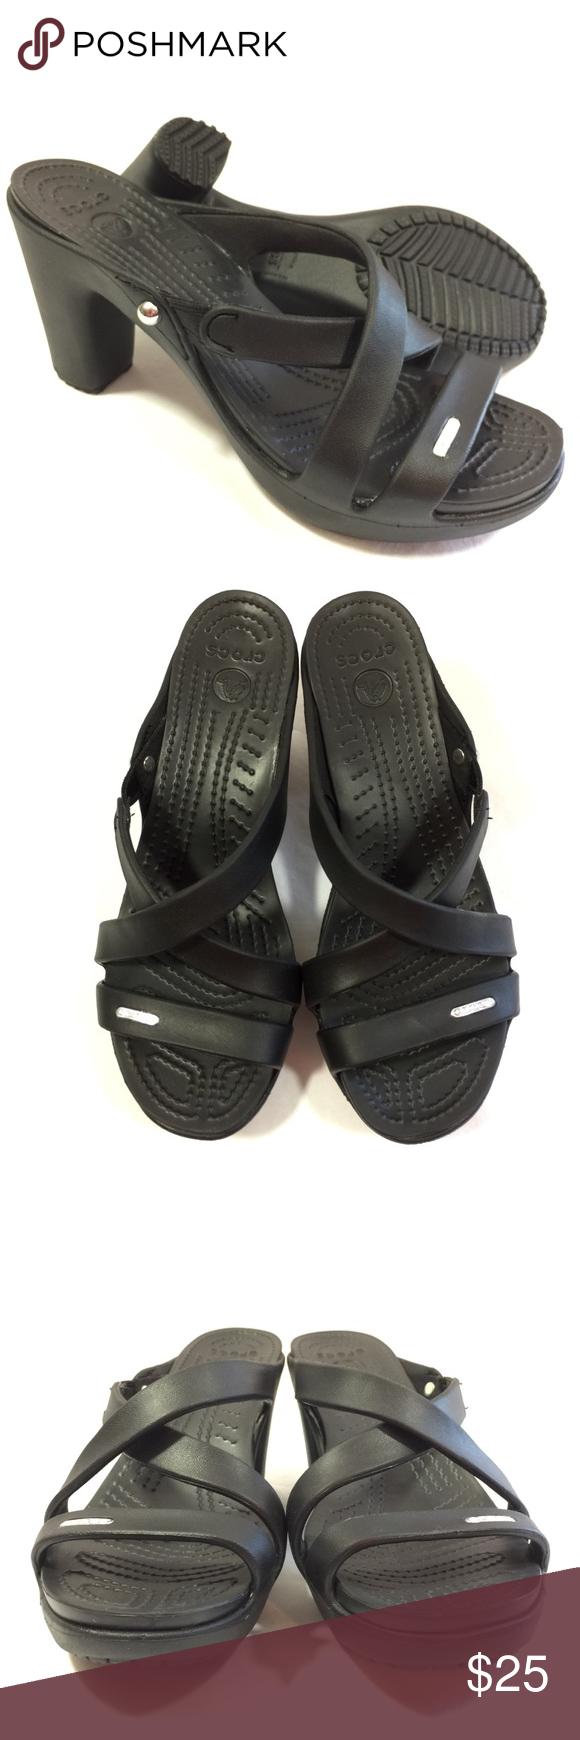 "f9cbca461368 Crocs Women s Black Cyprus IV Heels Sandals Size 8 Nearly new. Only worn a  few times. 3.5"" Heel CROCS Shoes Heels"